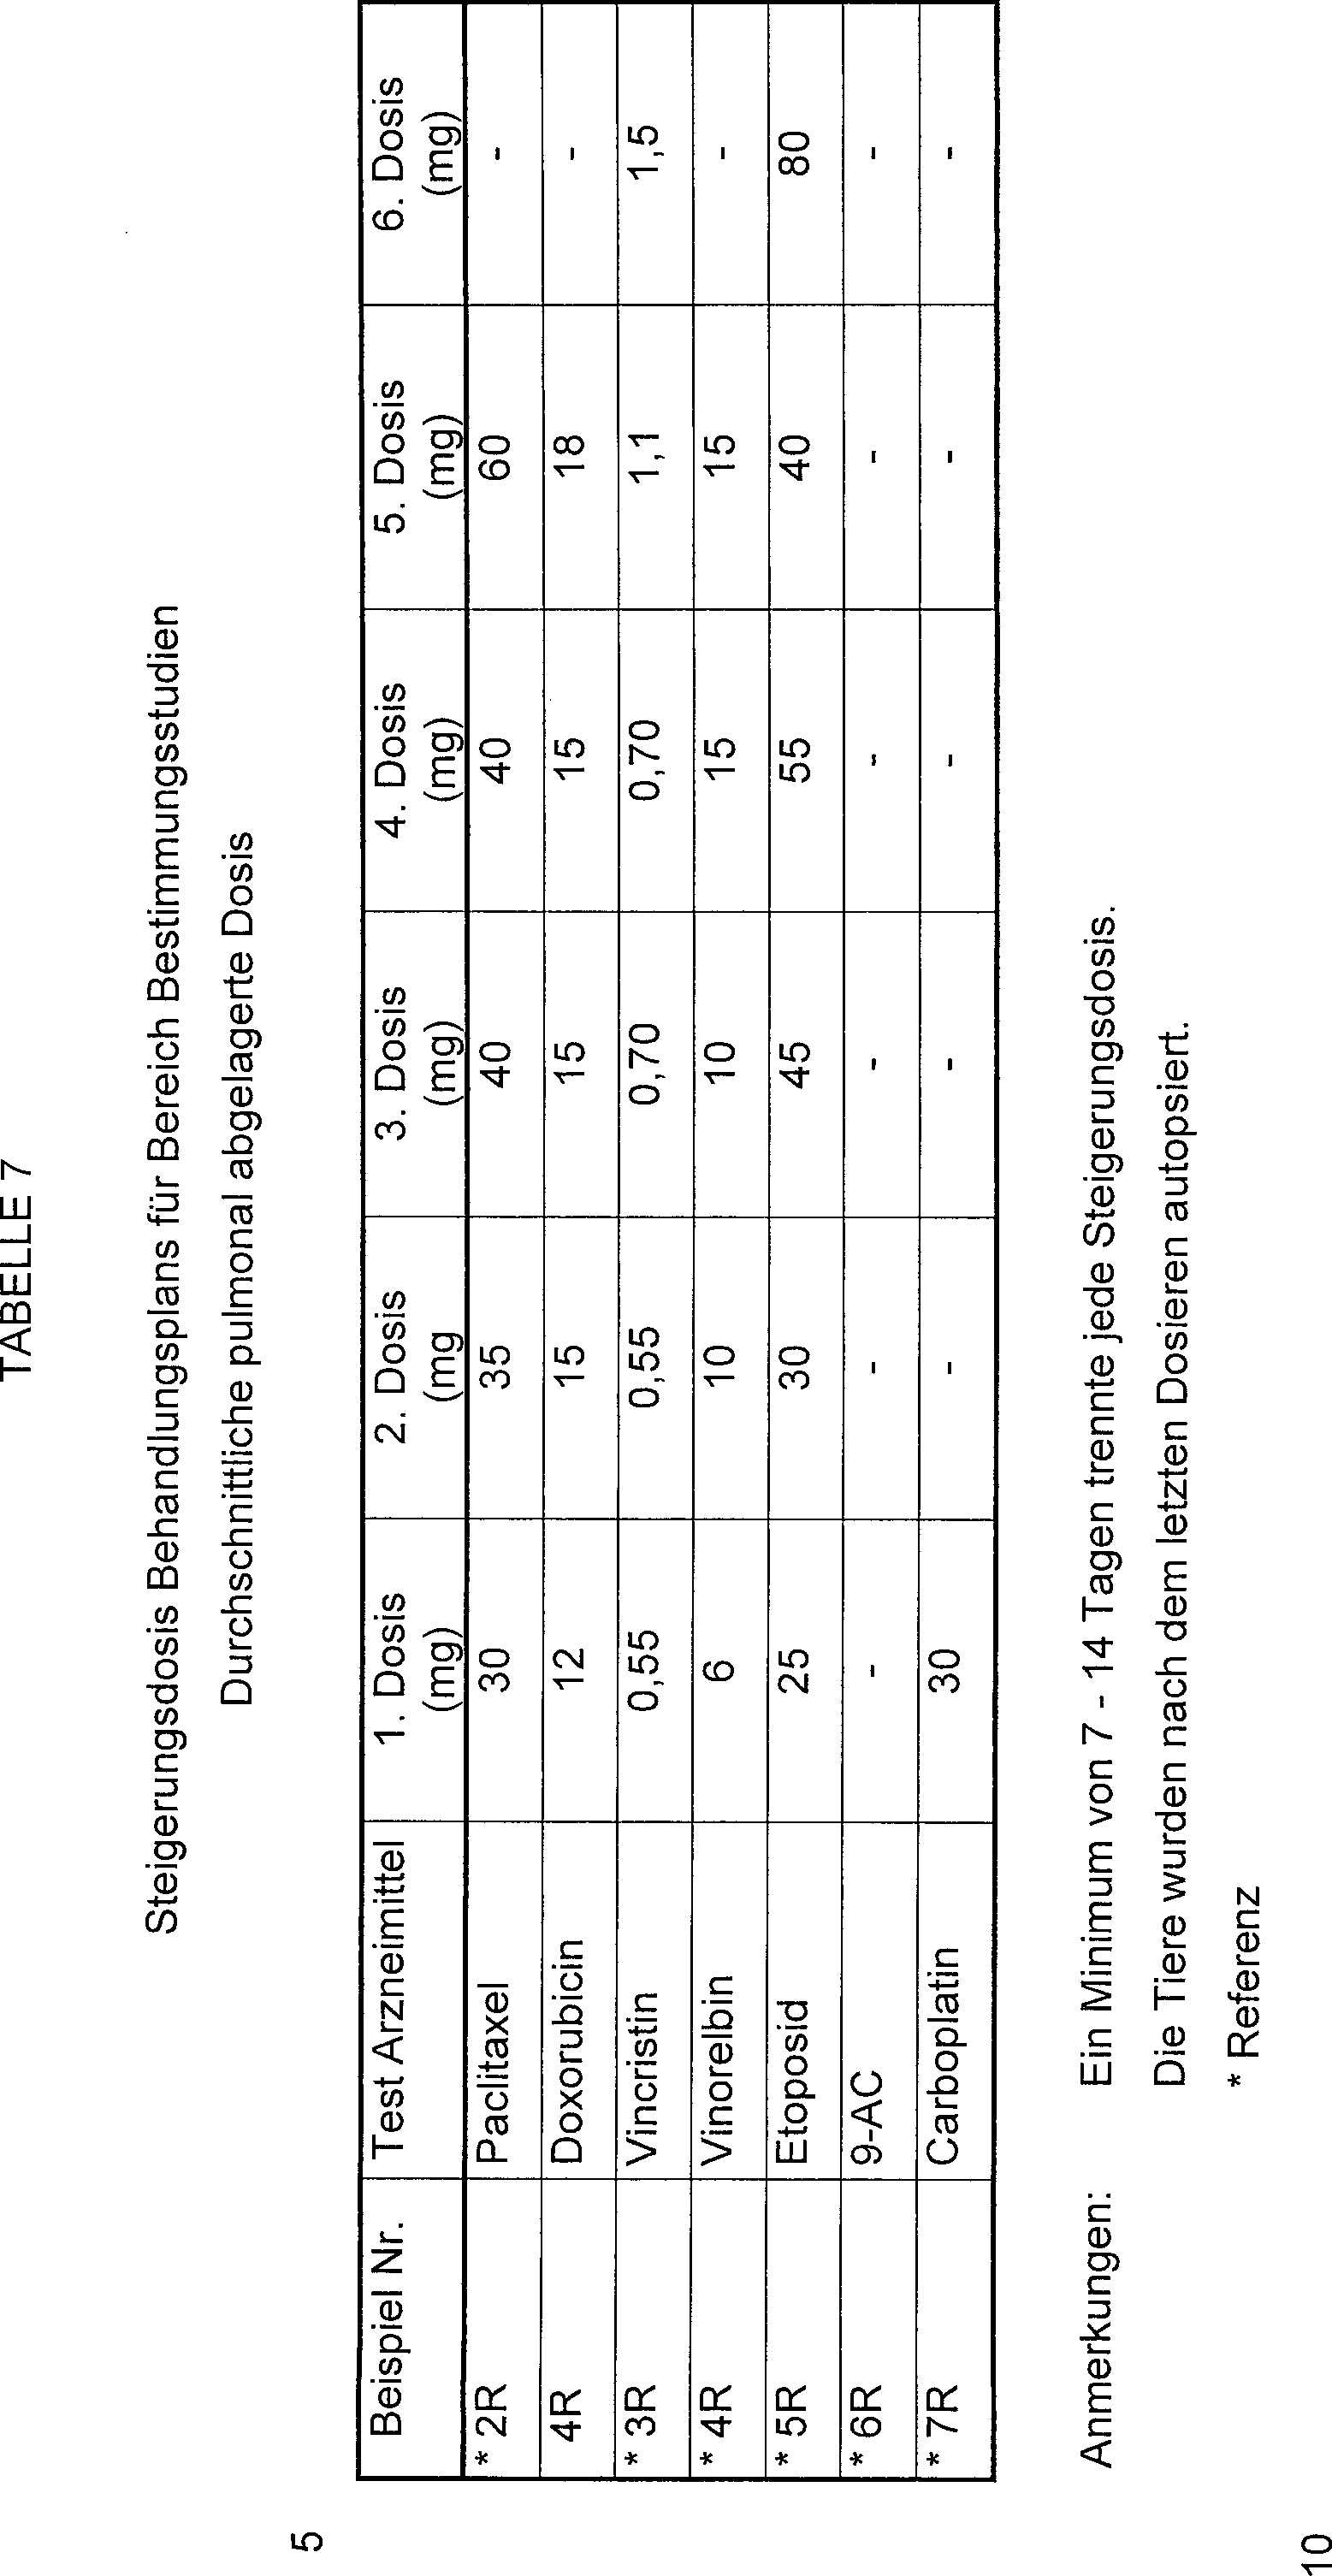 DE69737510T2 - Use of a non-encapsulated anticancer drug for the ...